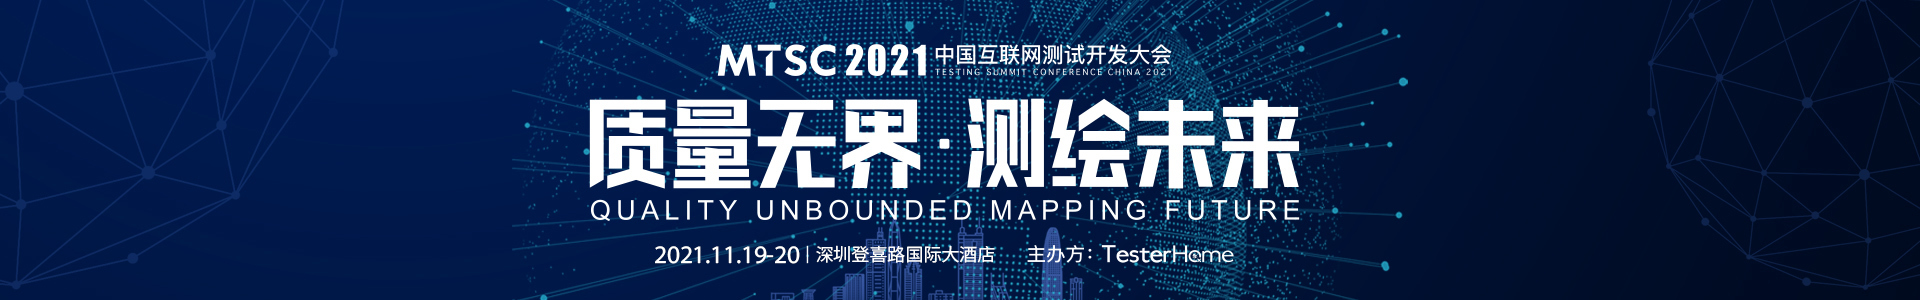 MTSC2021 中国互联网测试开发大会 深圳站